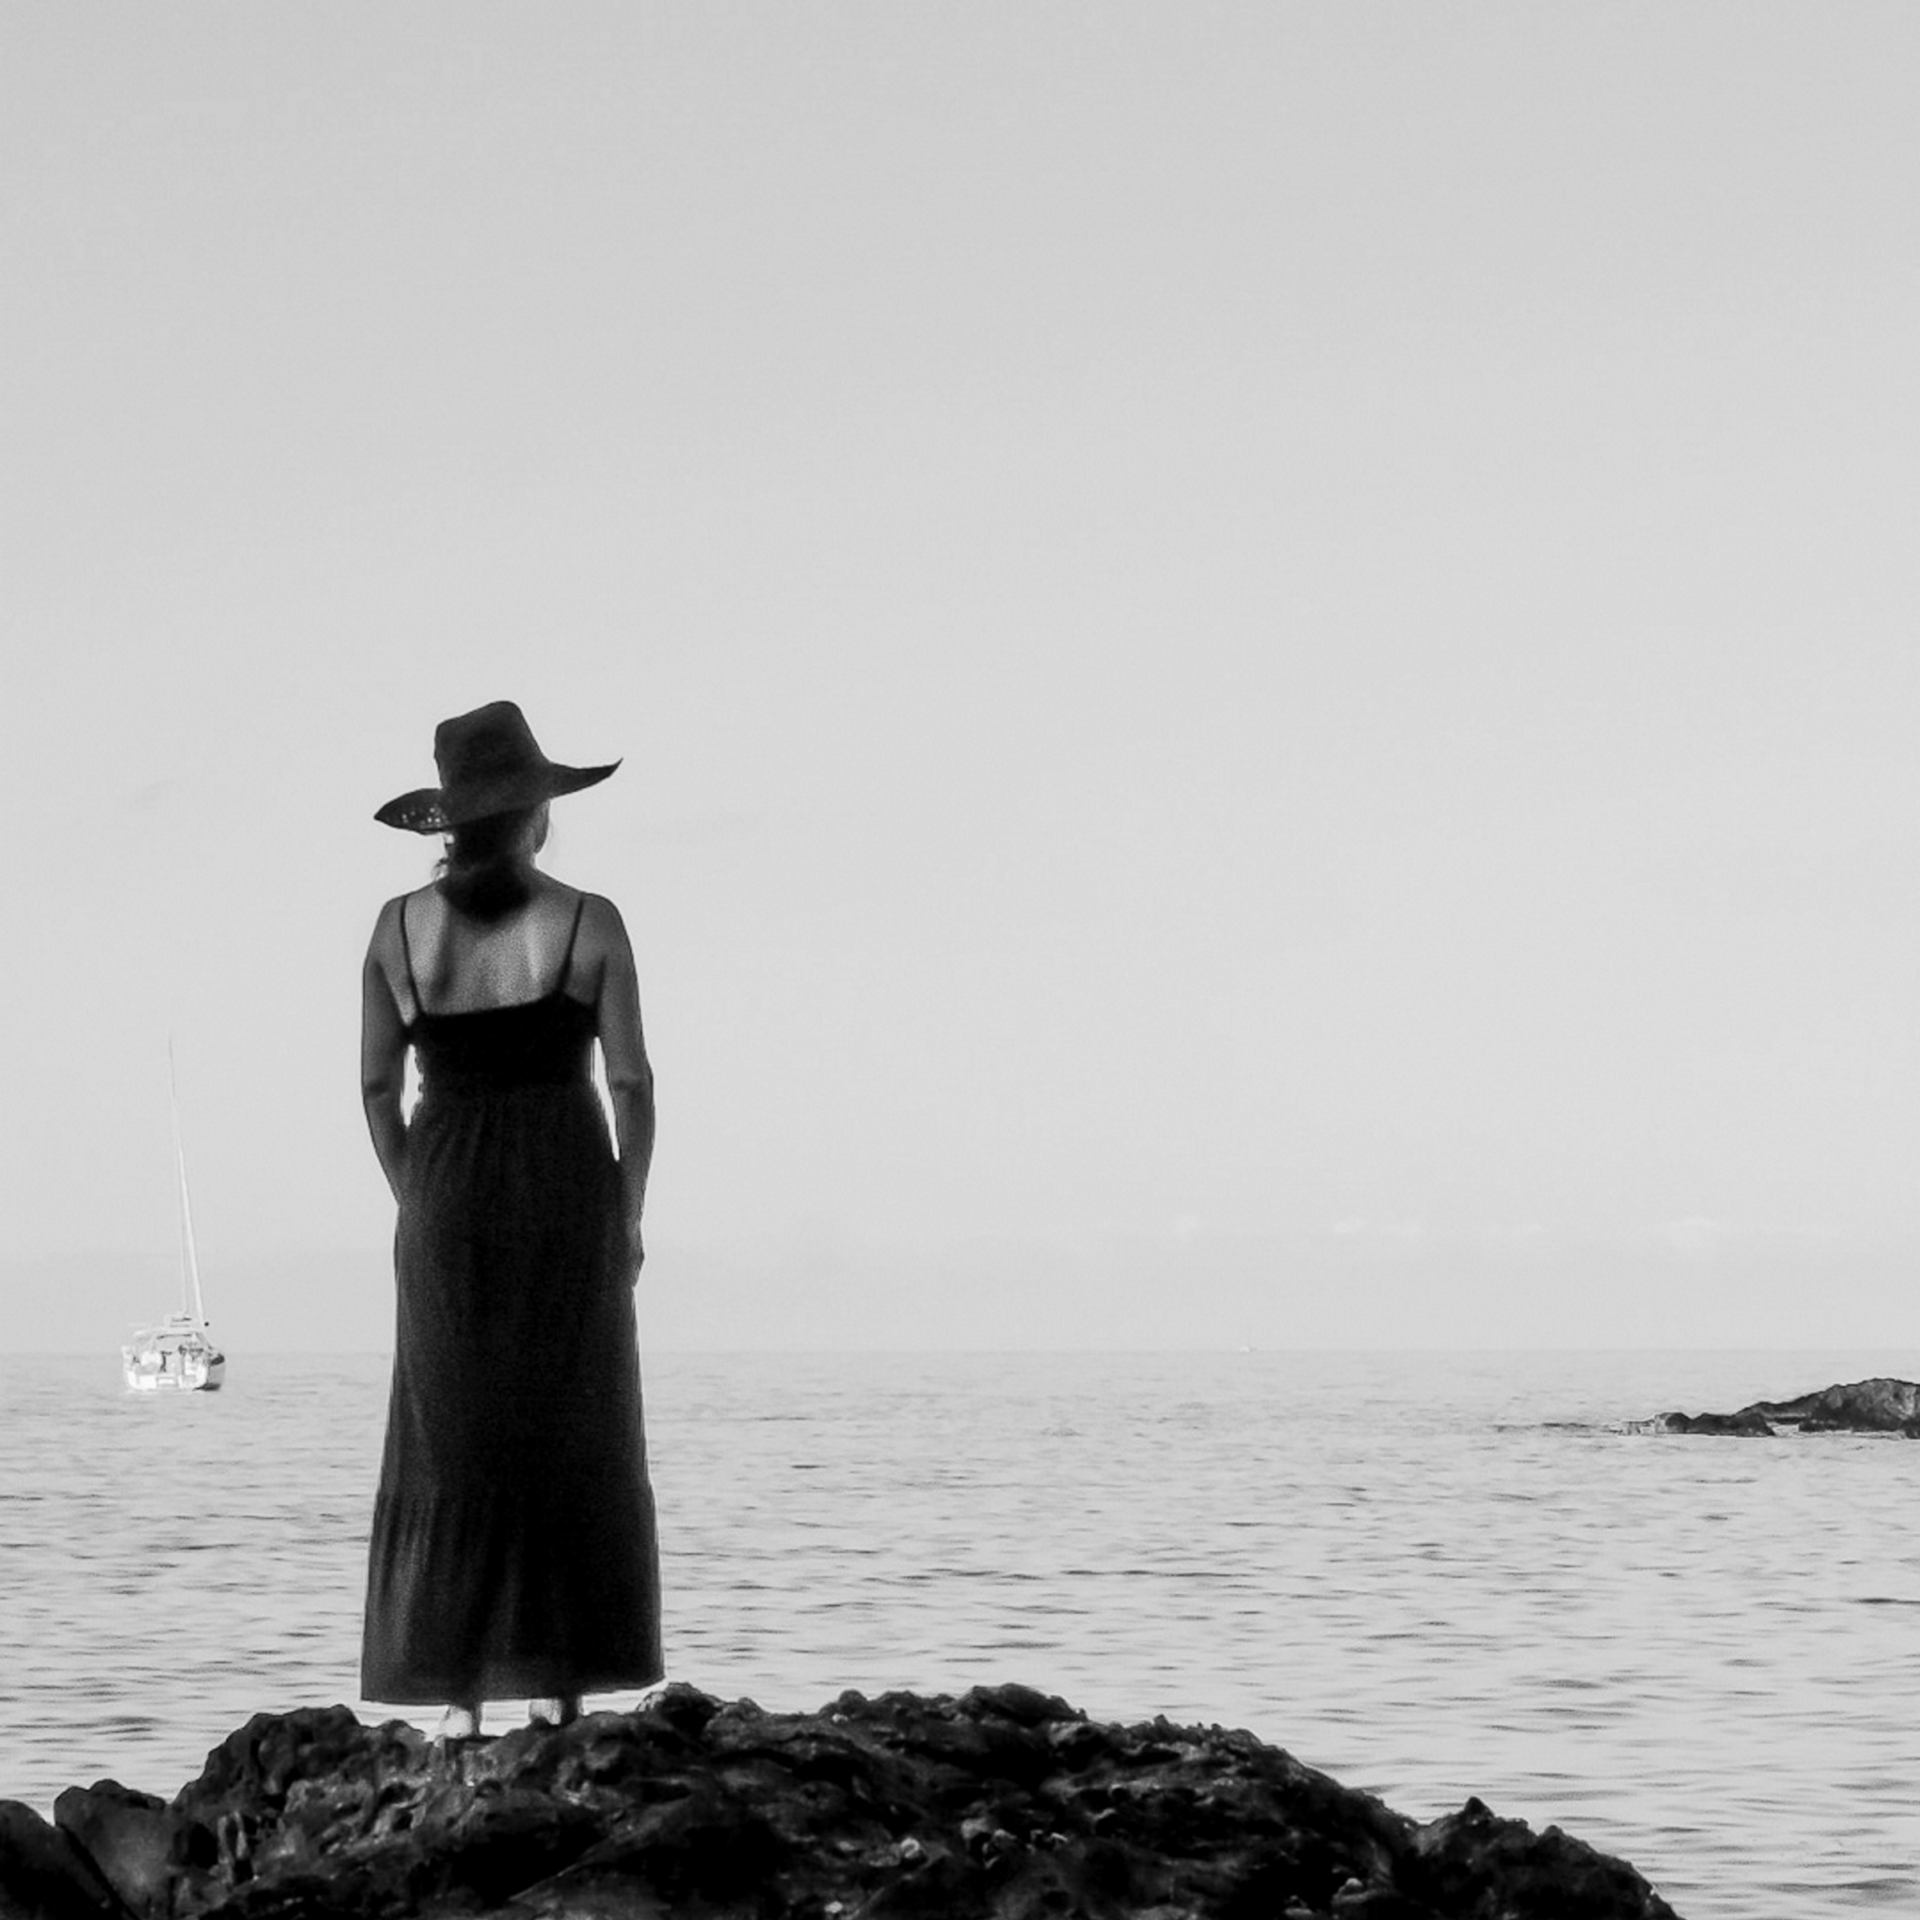 The woman who contemplates the sea